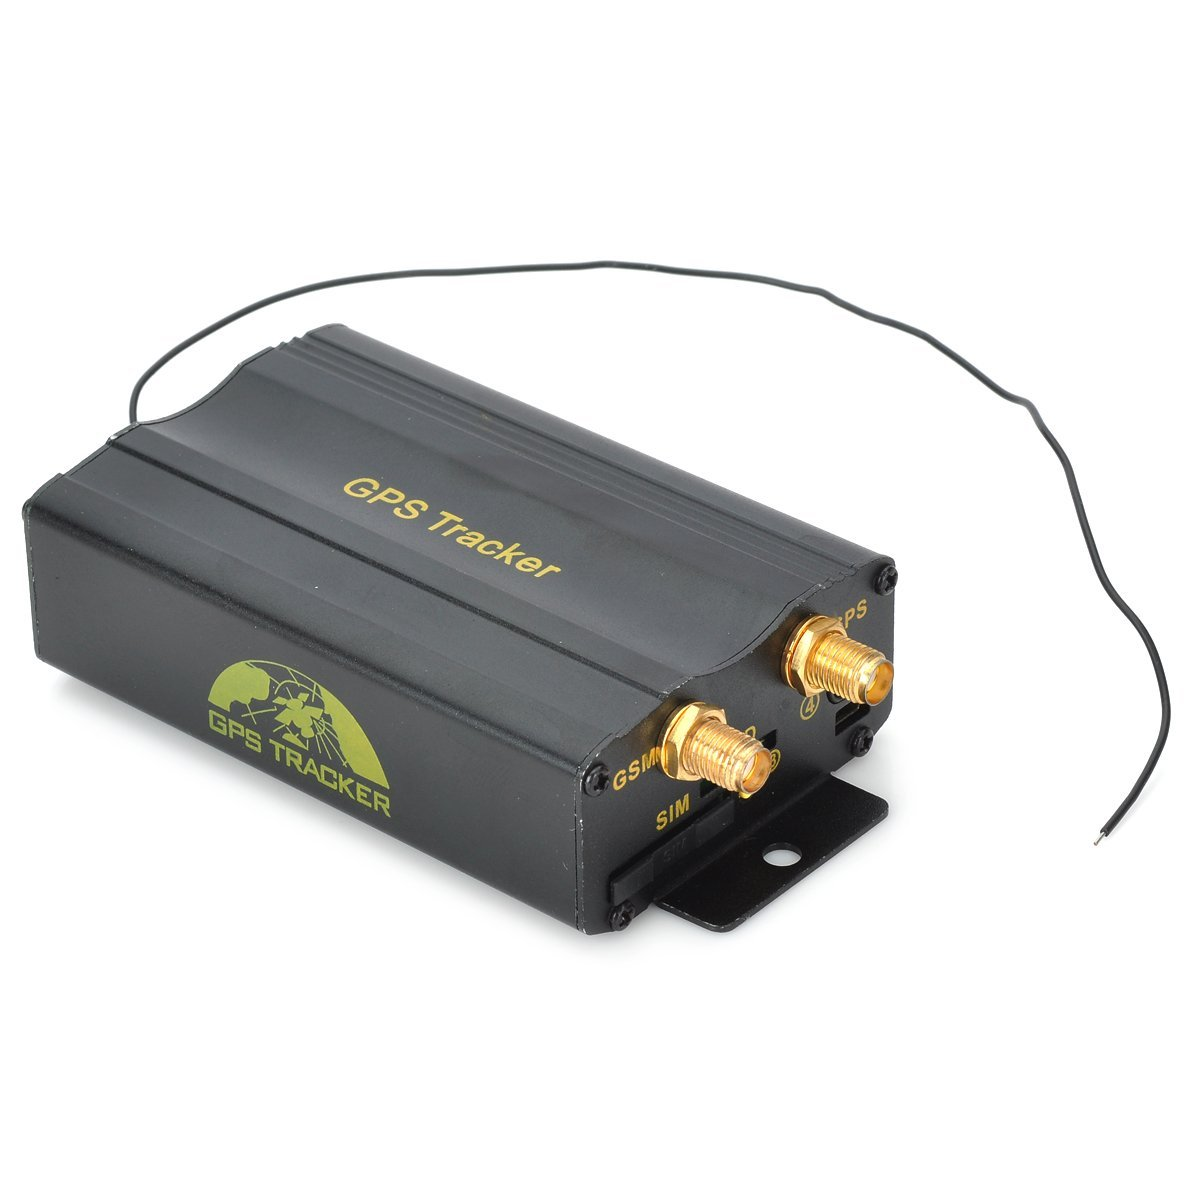 AVOLUTION Vehicle Car GPS SMS GPRS Tracker Real Time Tracking Device Syatem New Black